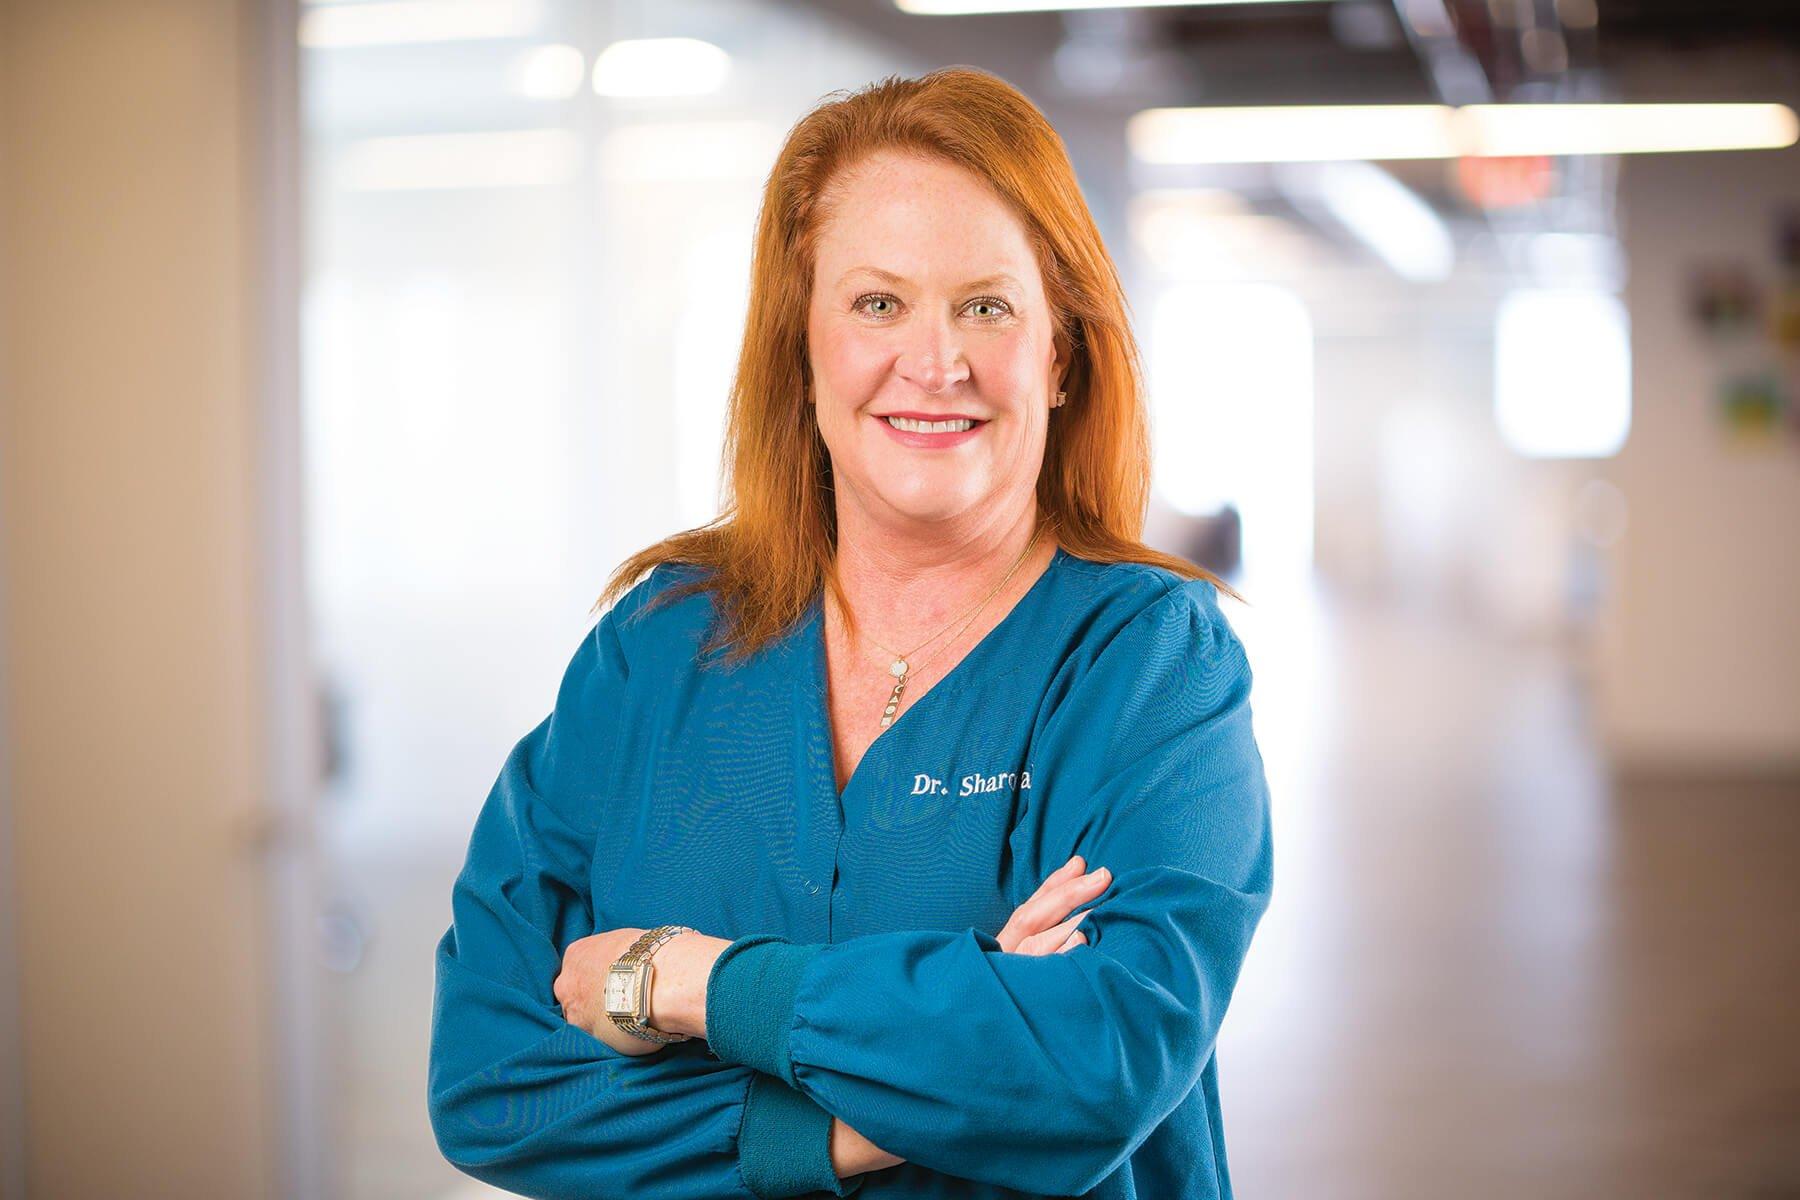 Dr. Sharon Paluga